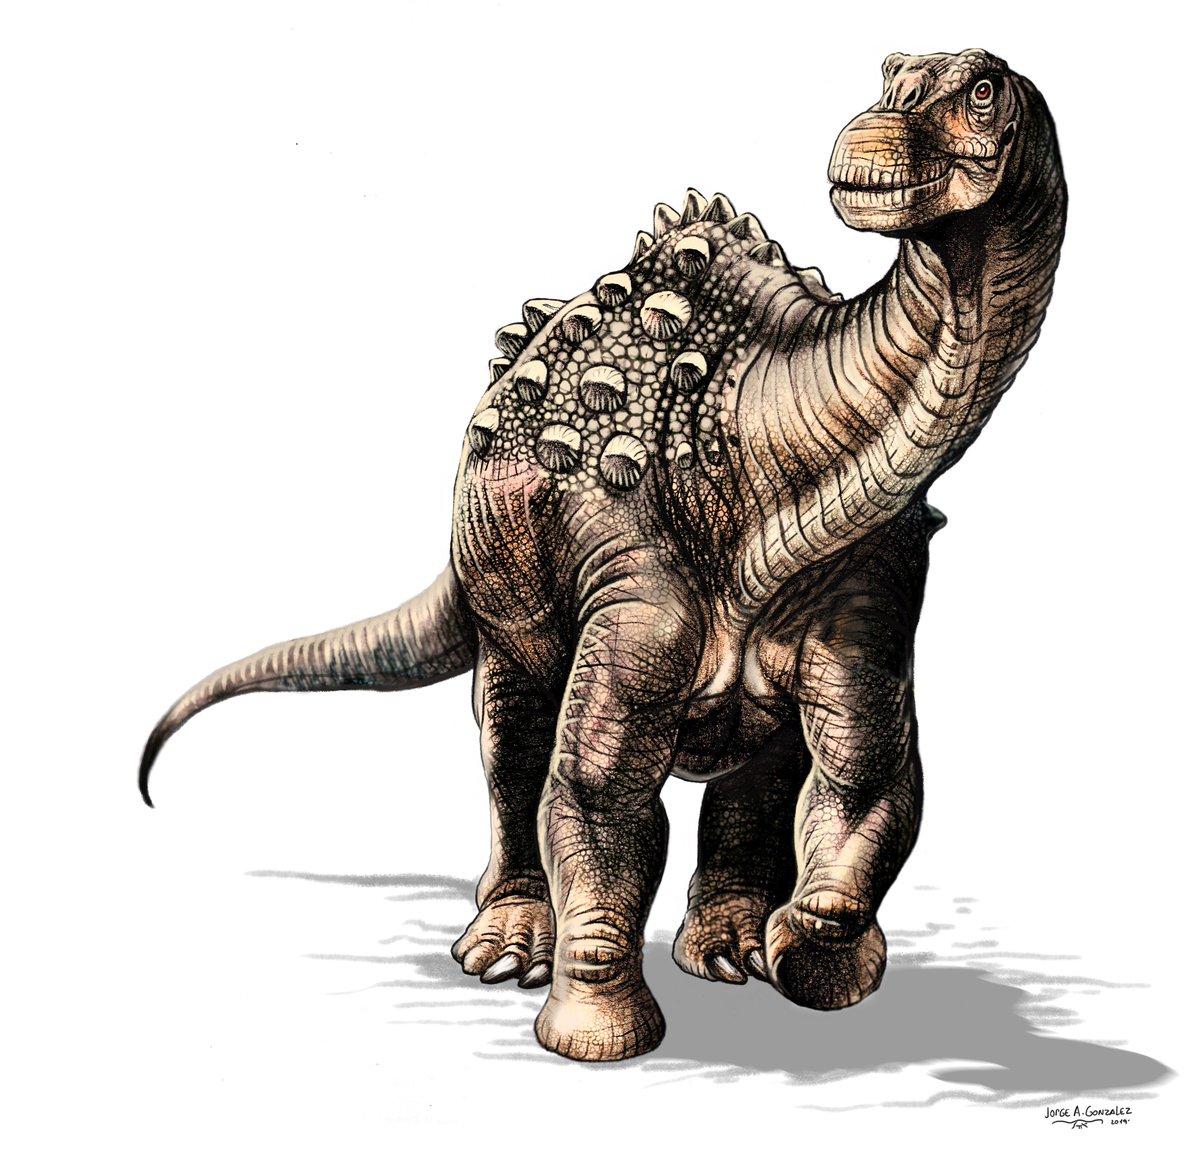 yamanasaurus_lojaensis_jorge_antonio_gonzalez.jpg